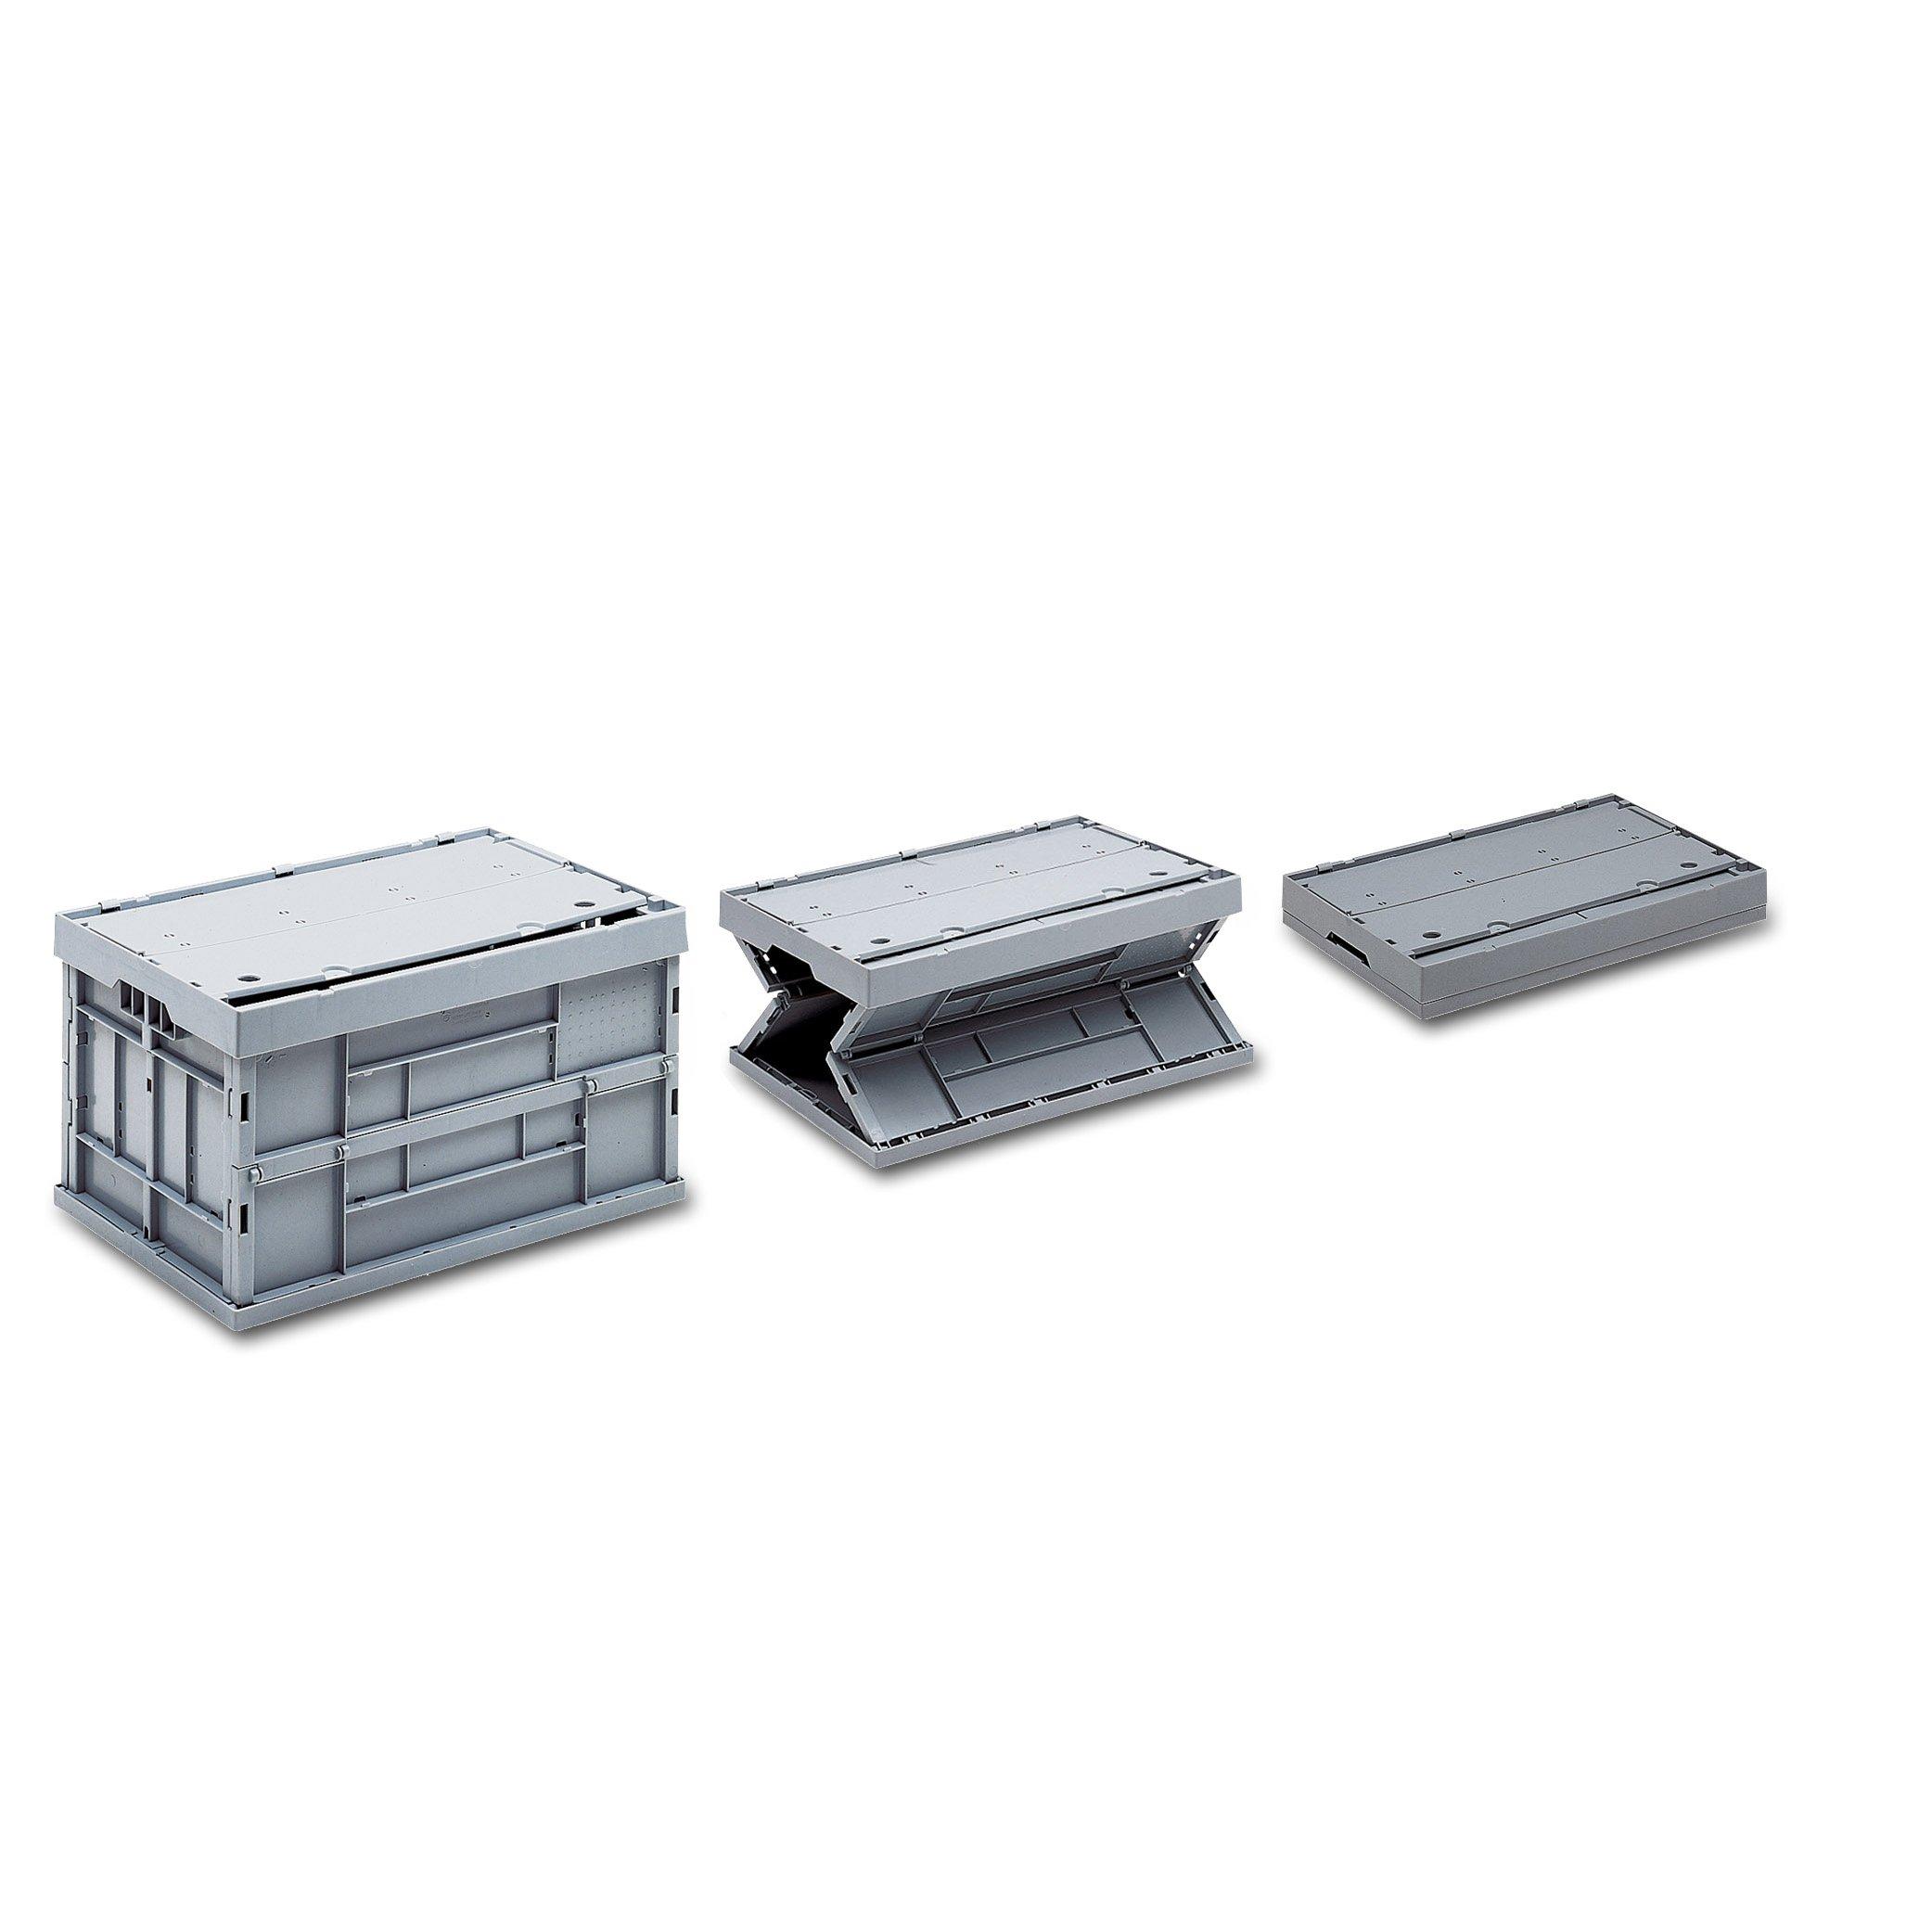 Foldable-mallit